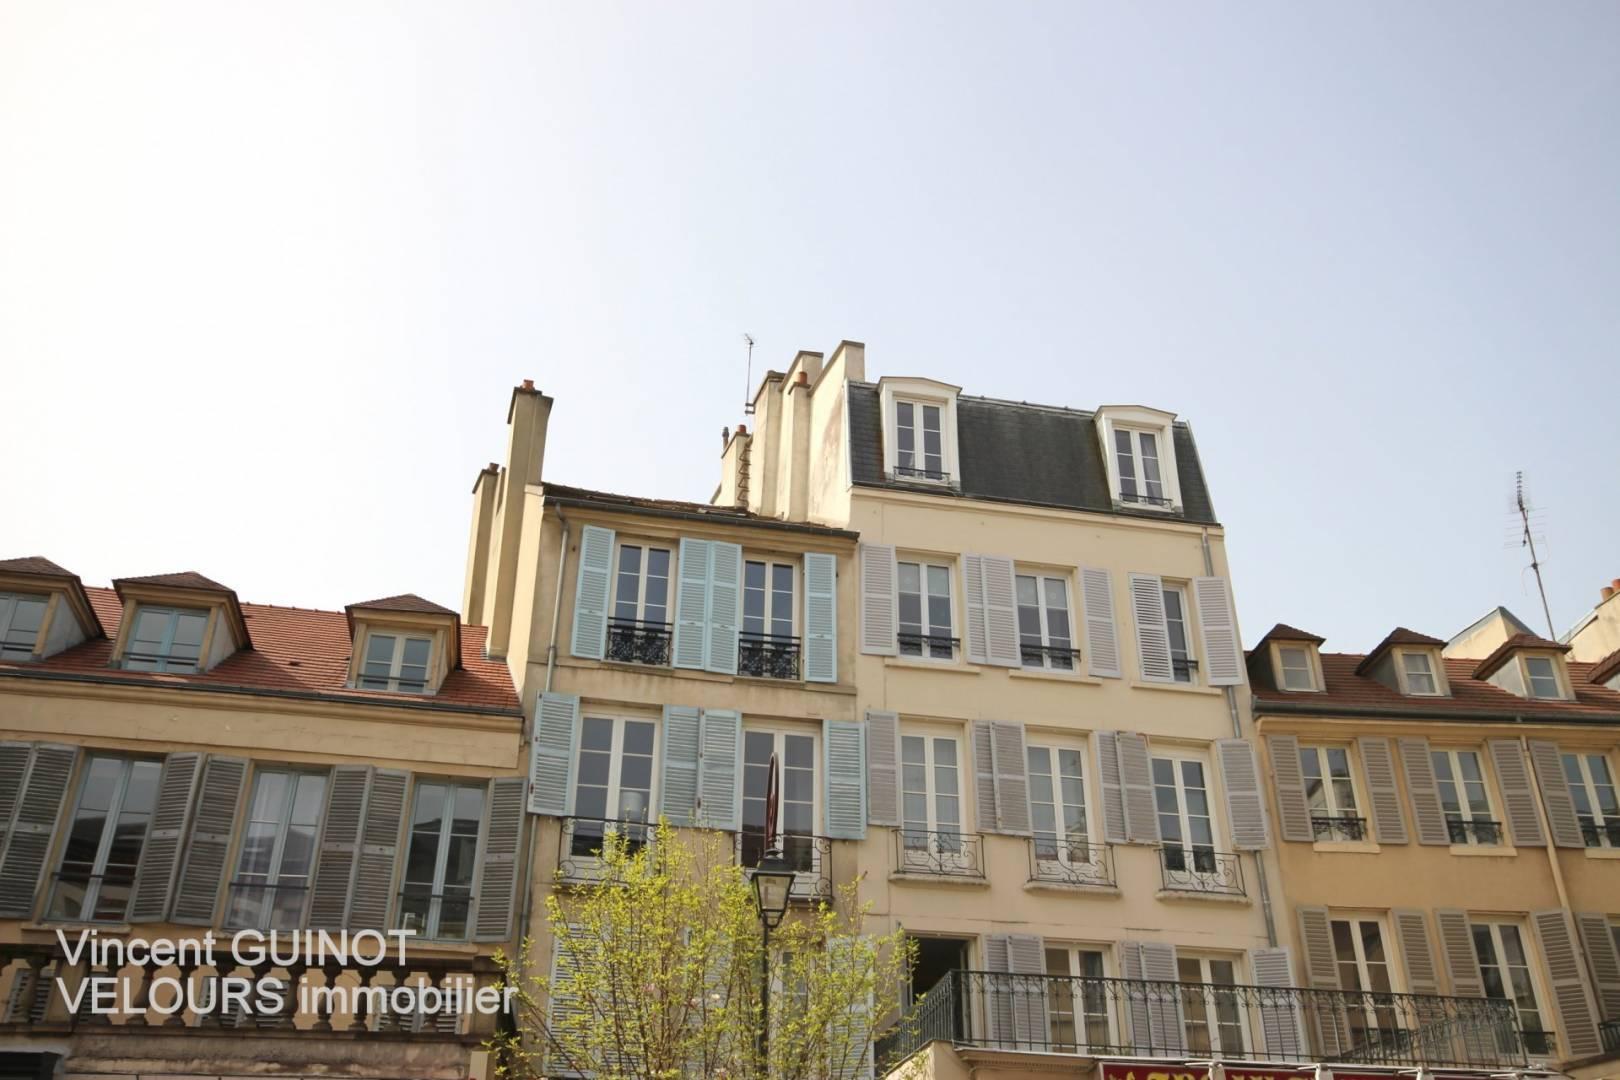 1 5 Saint-Germain-en-Laye